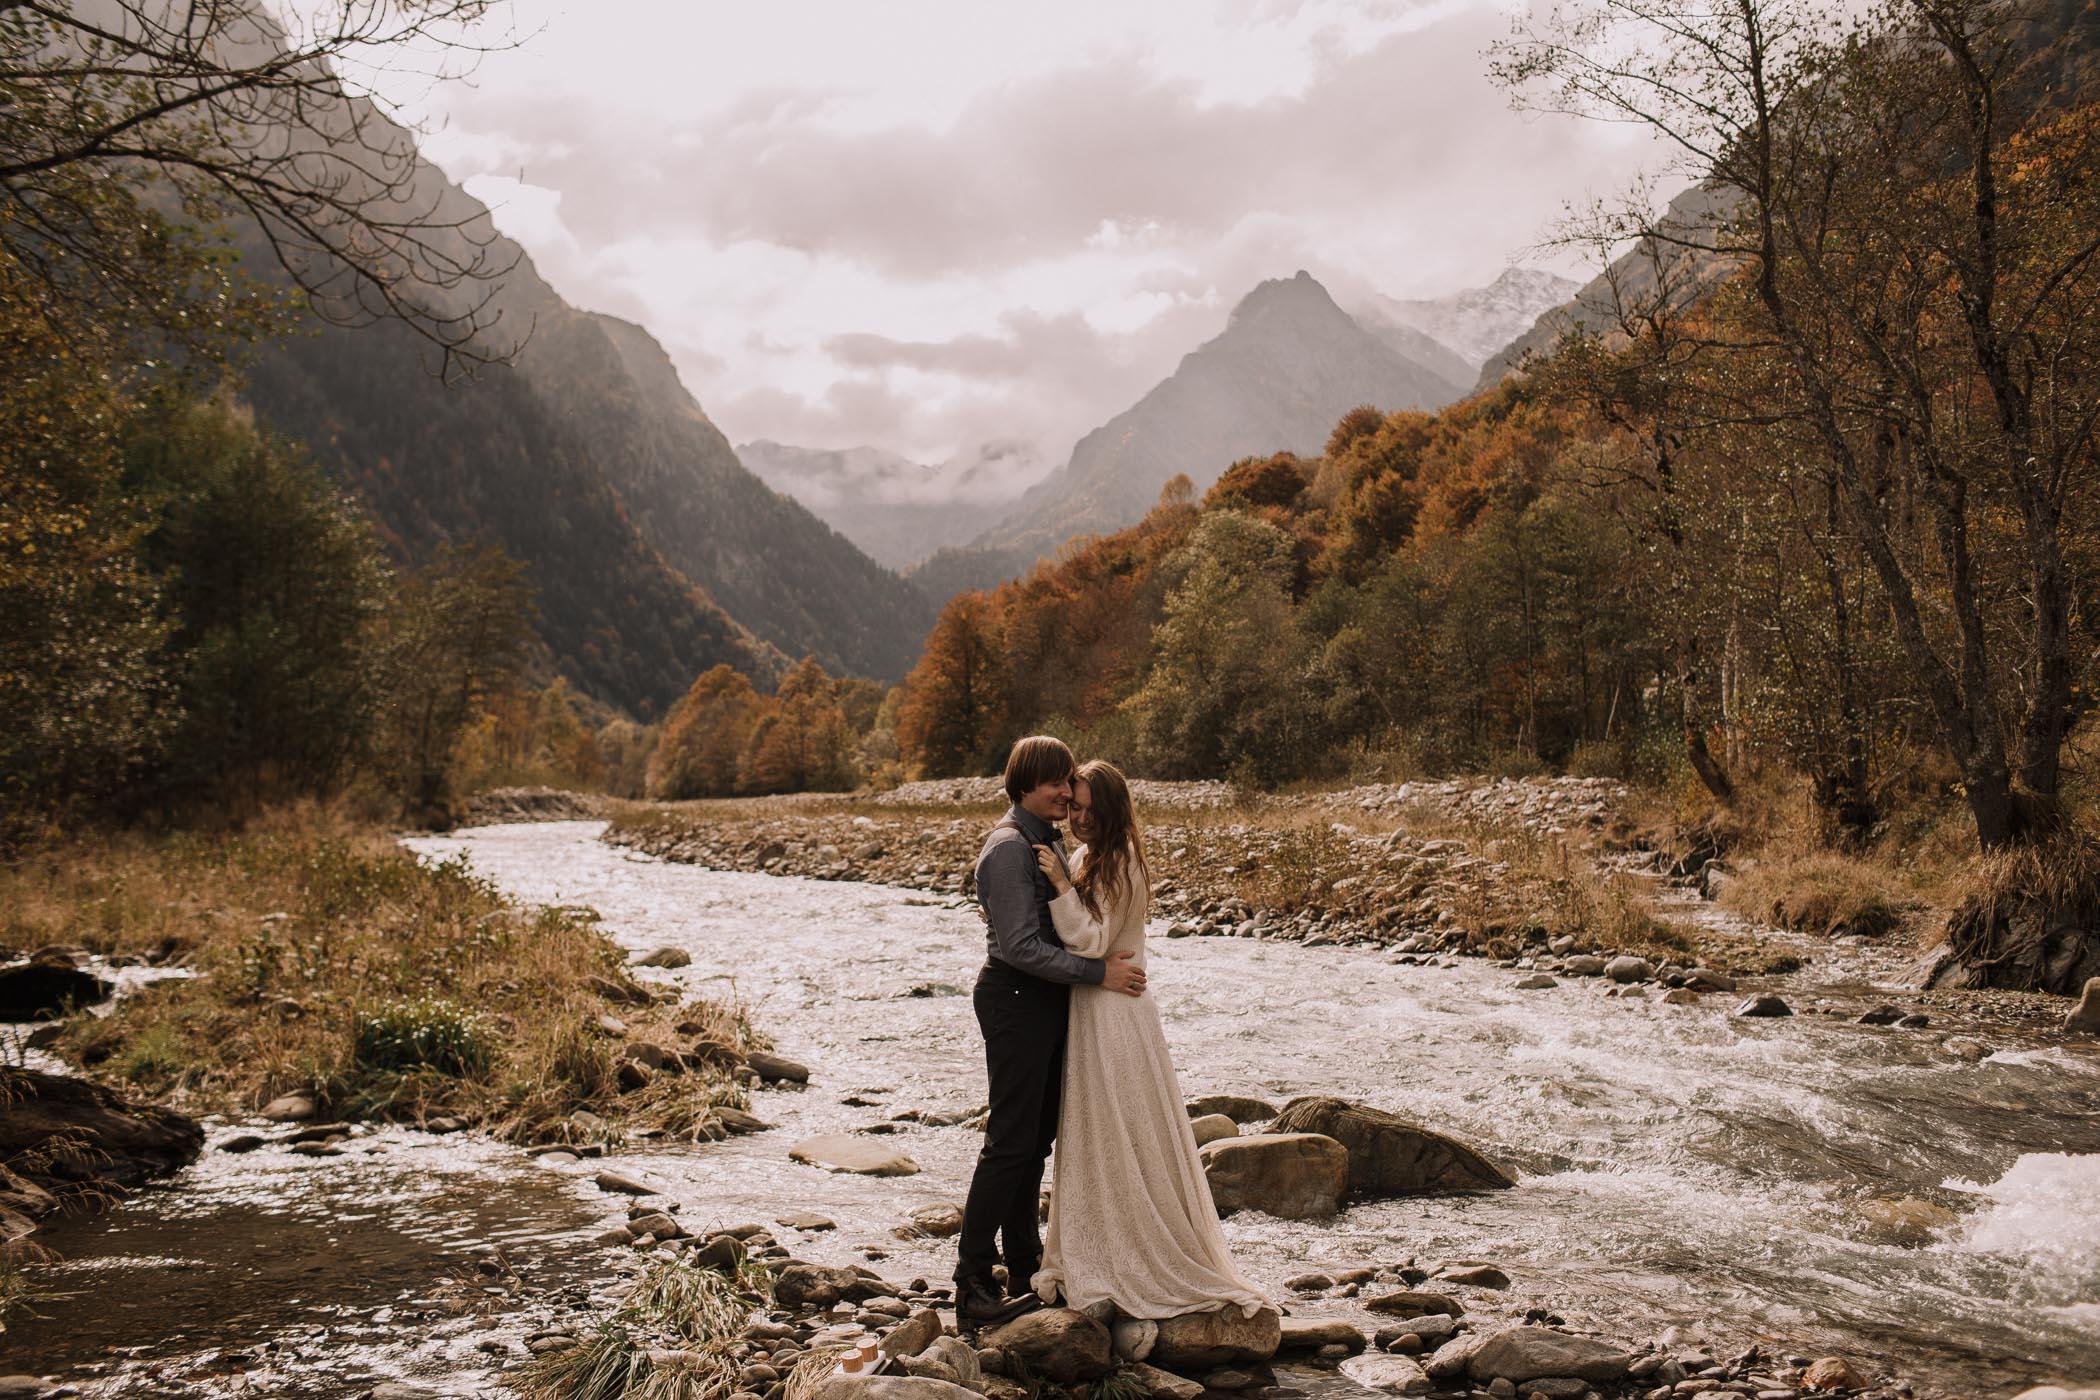 Photographe-mariage-bordeaux-jeremy-boyer-35.jpg